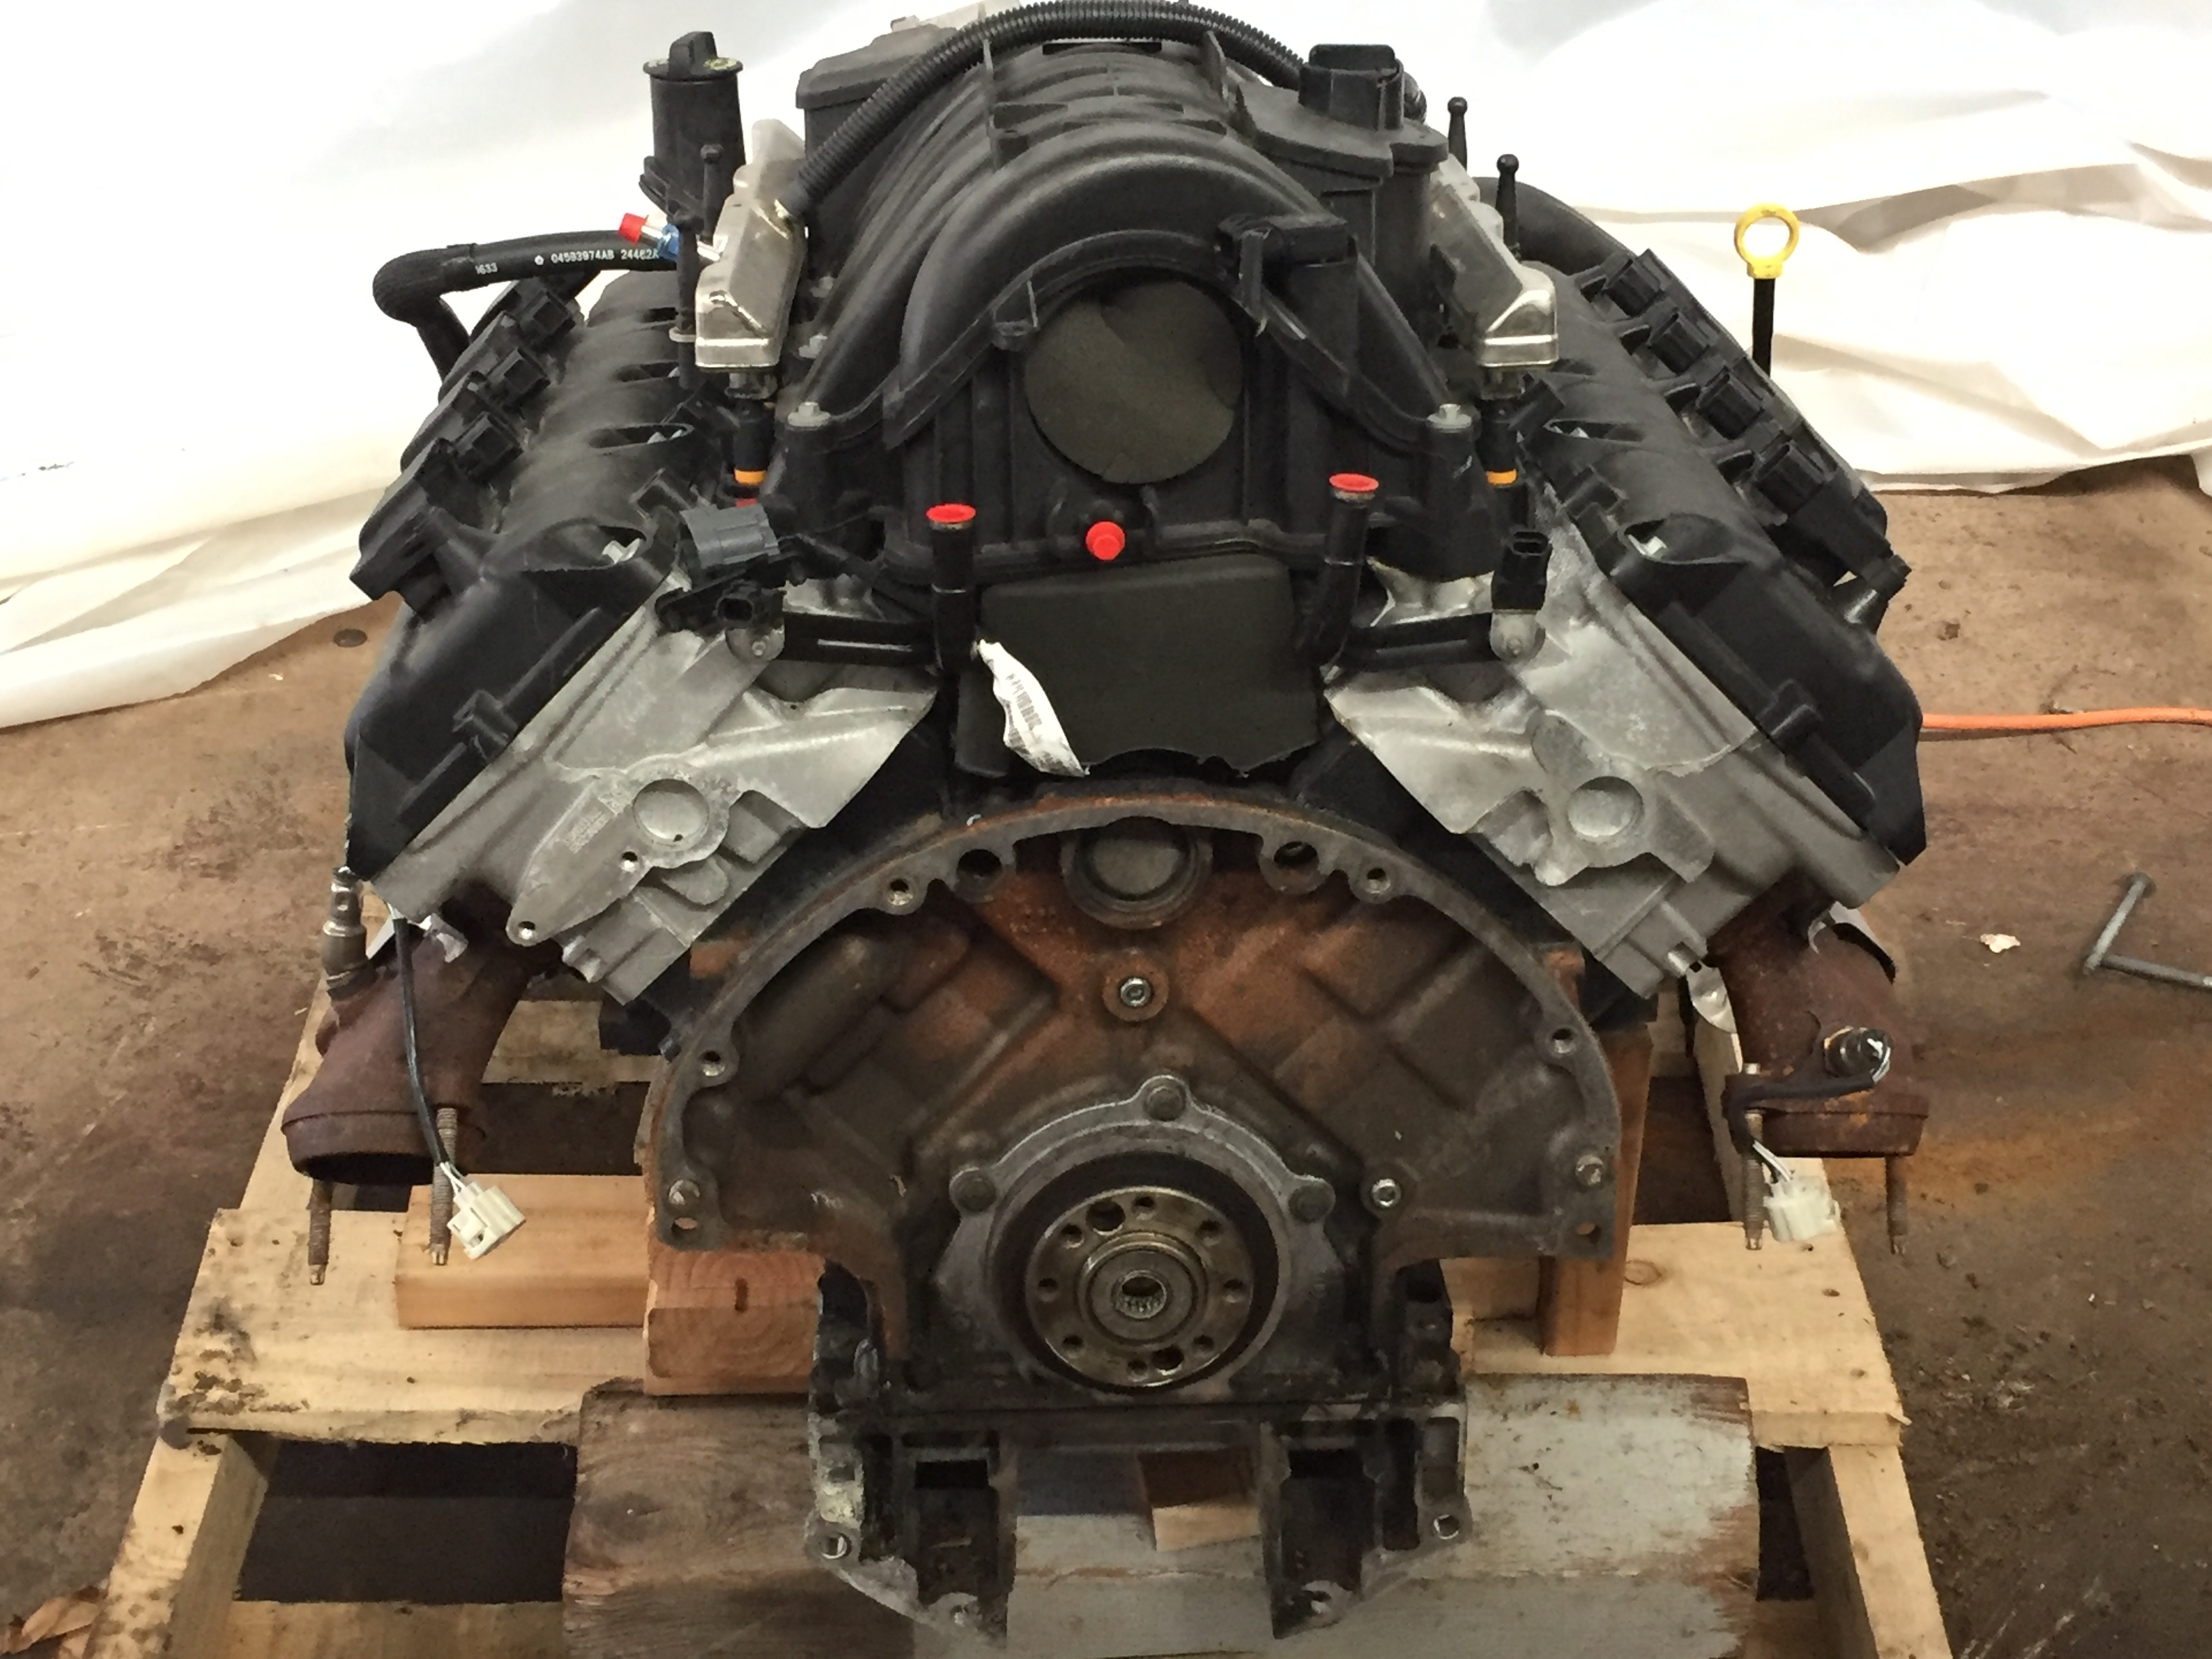 5.7L engine transmission complete take-out